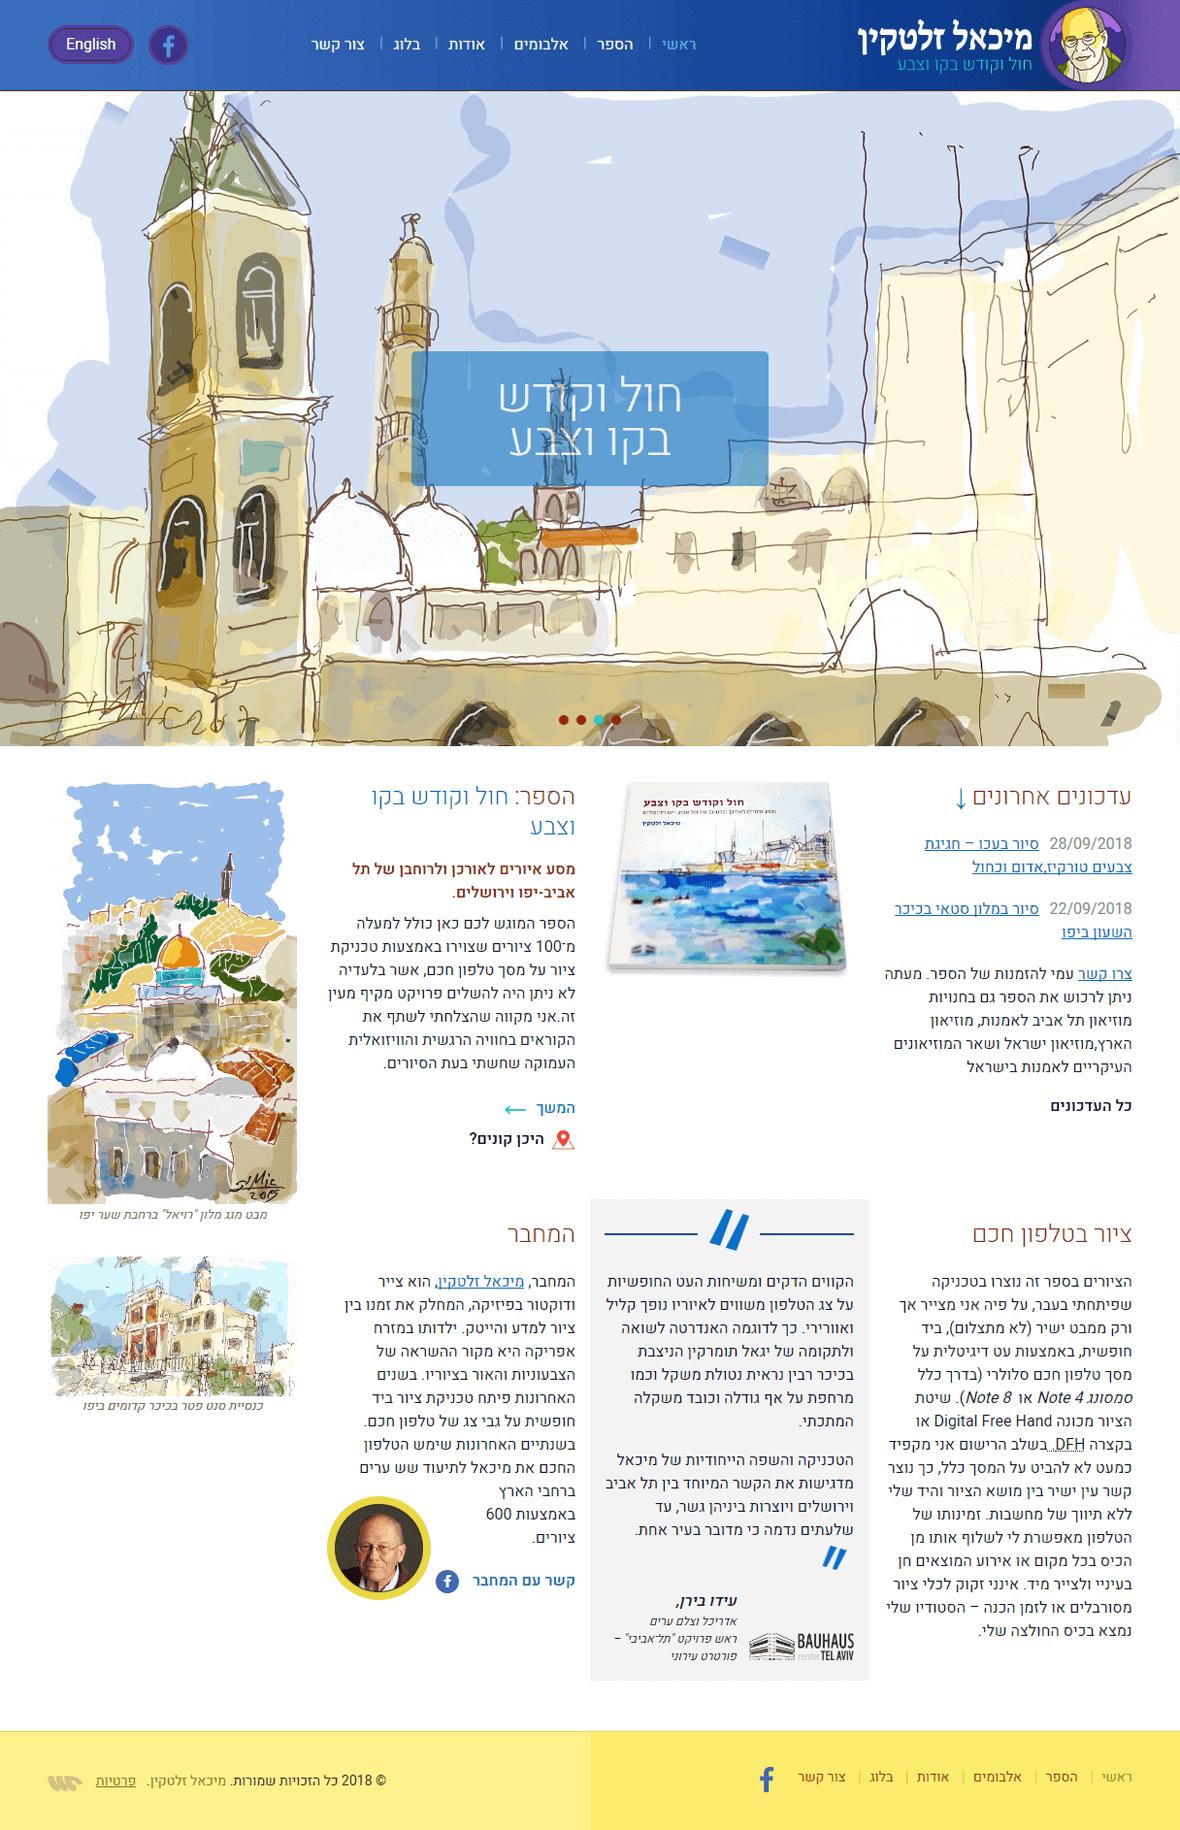 Digital Artist's Website